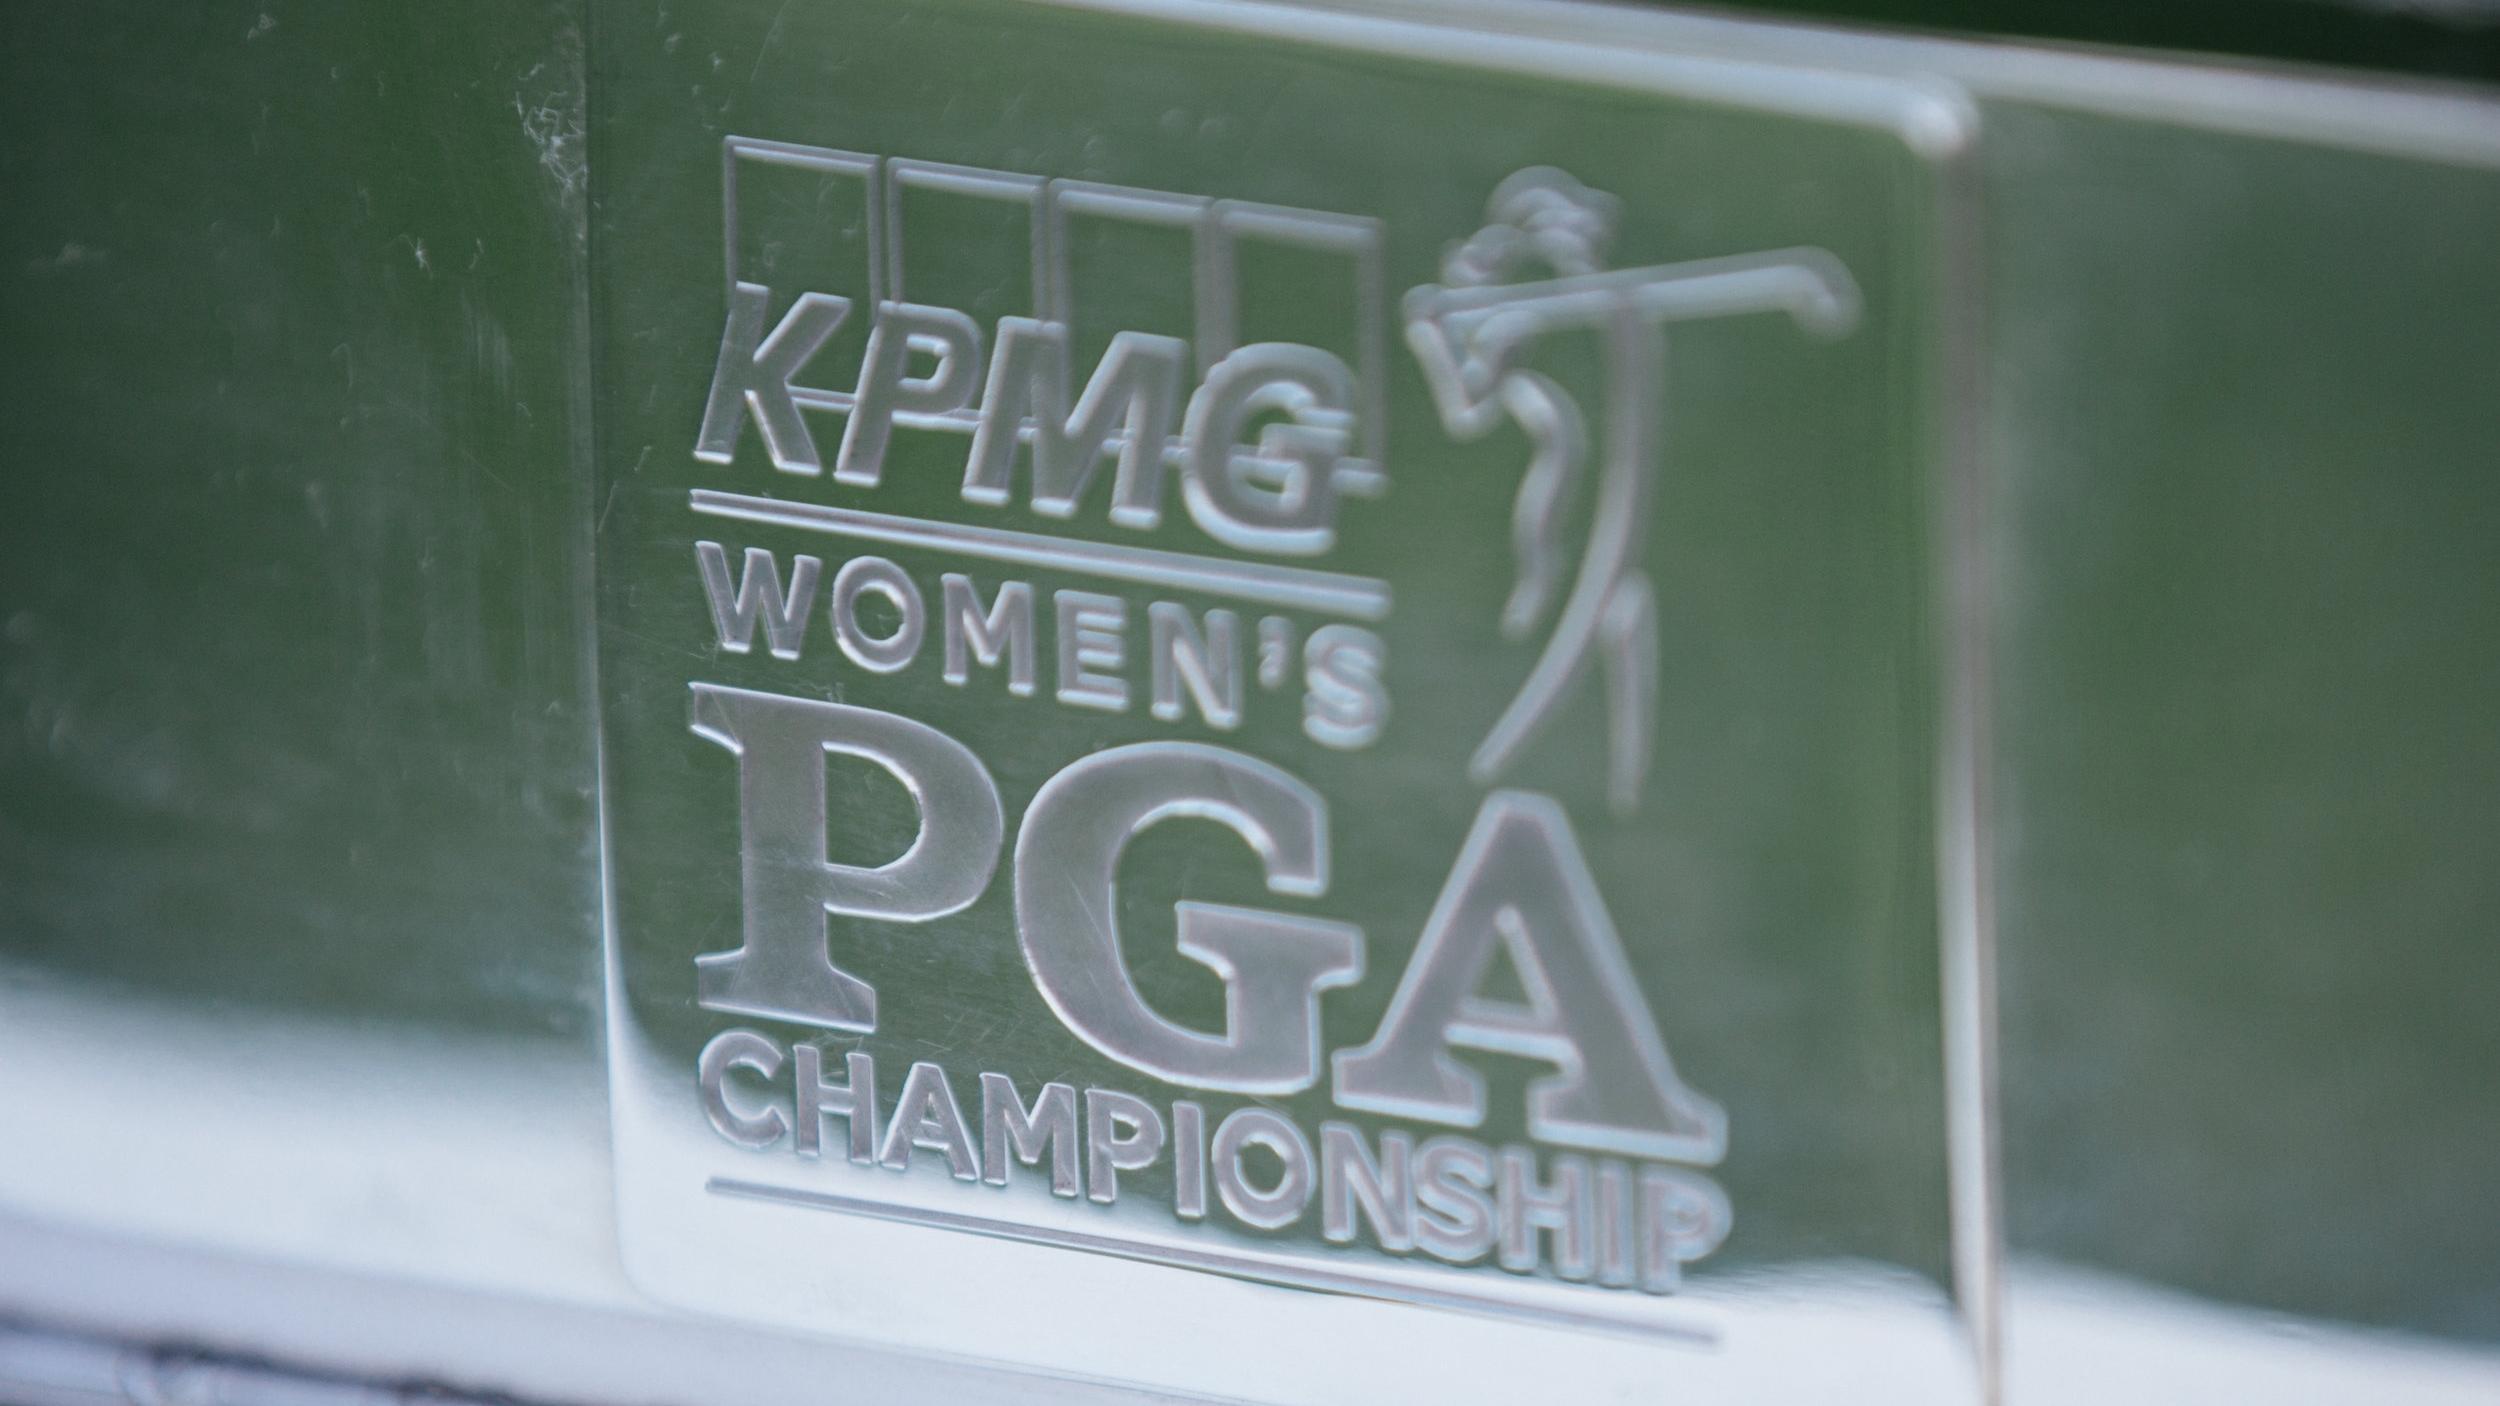 2018-KPMG-Womens-PGA-Championship-Kemper-Lakes-Golf-Club